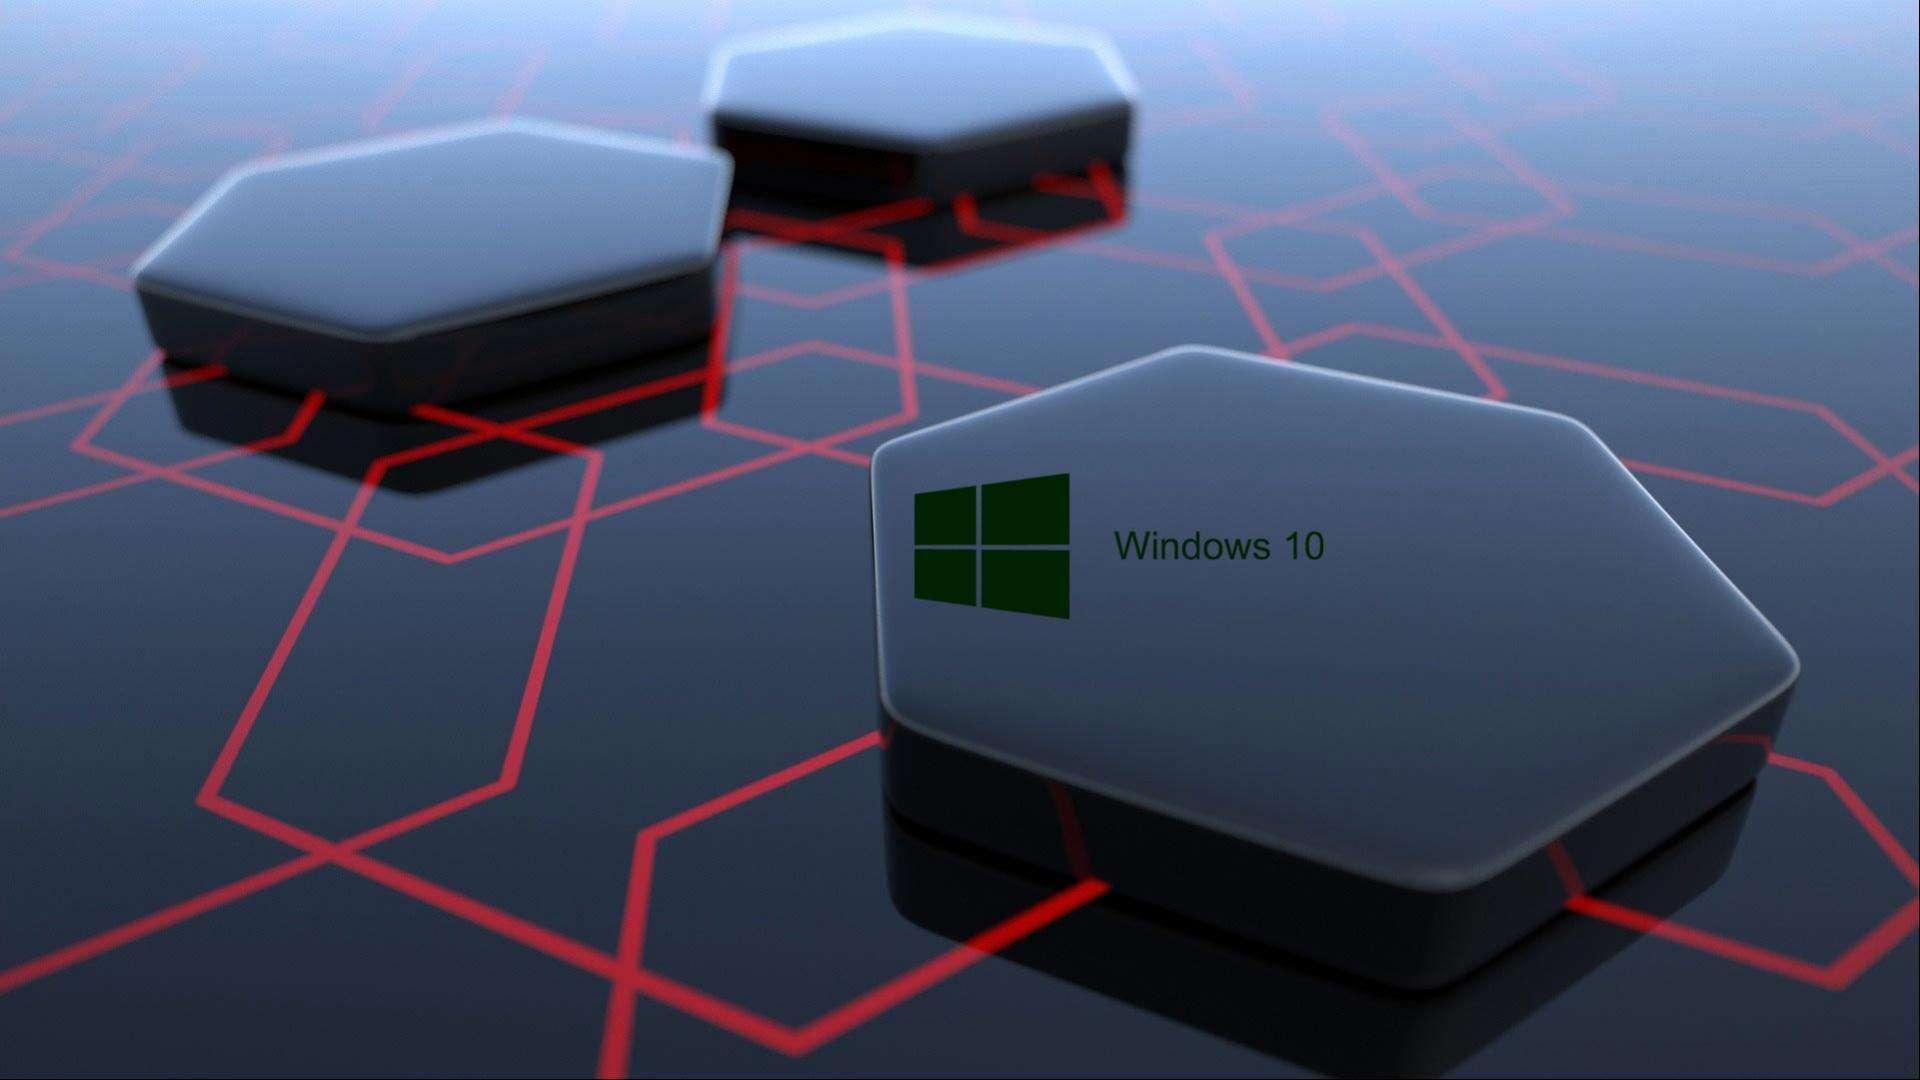 Windows-10-HD-Wallpaper-20